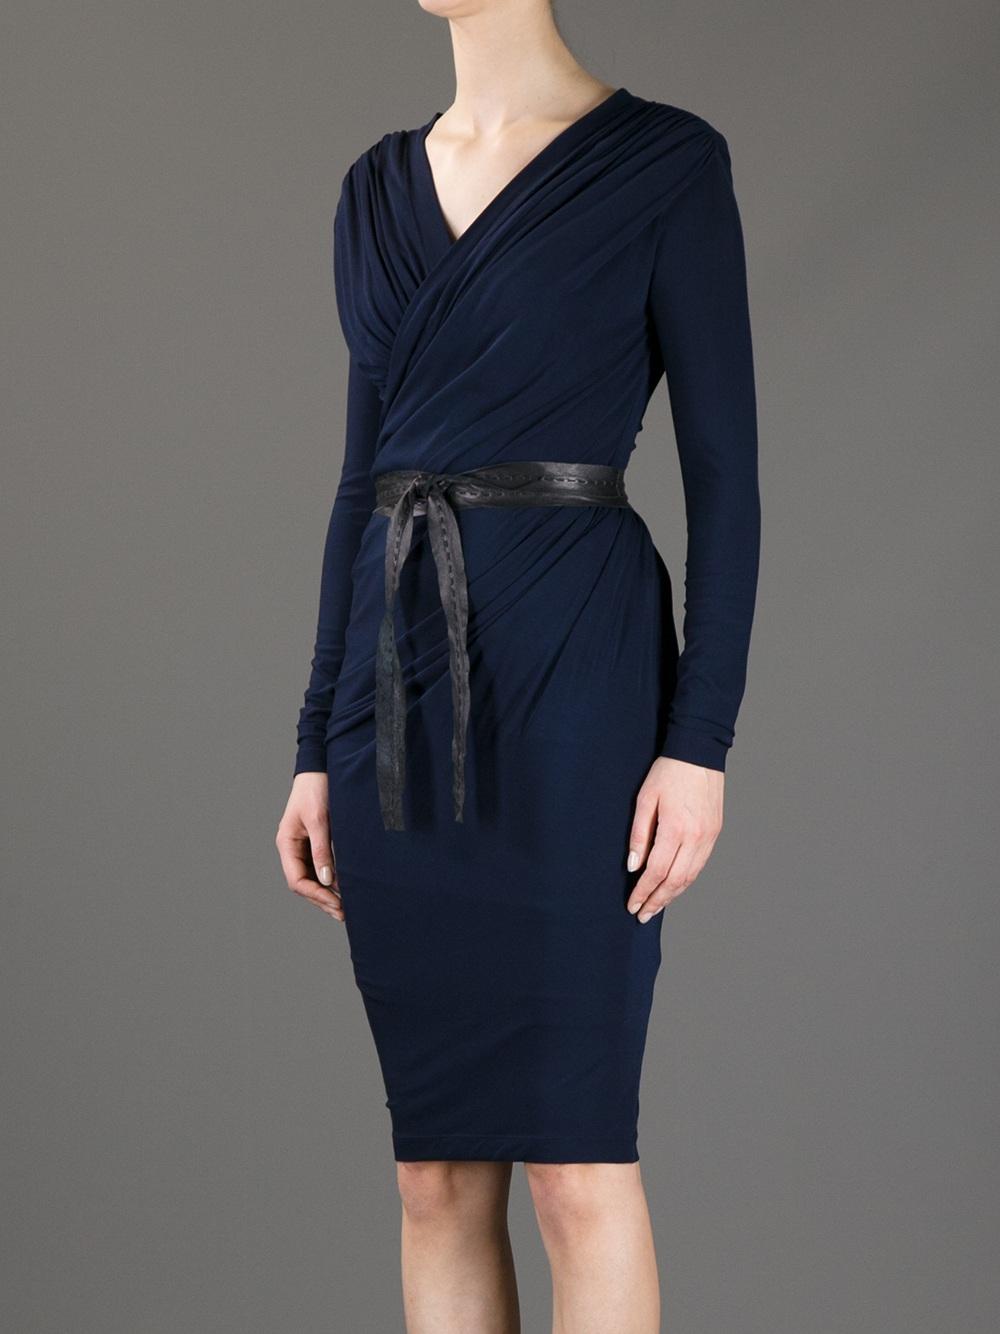 Donna Karan Belted Wrap Dress In Blue Lyst